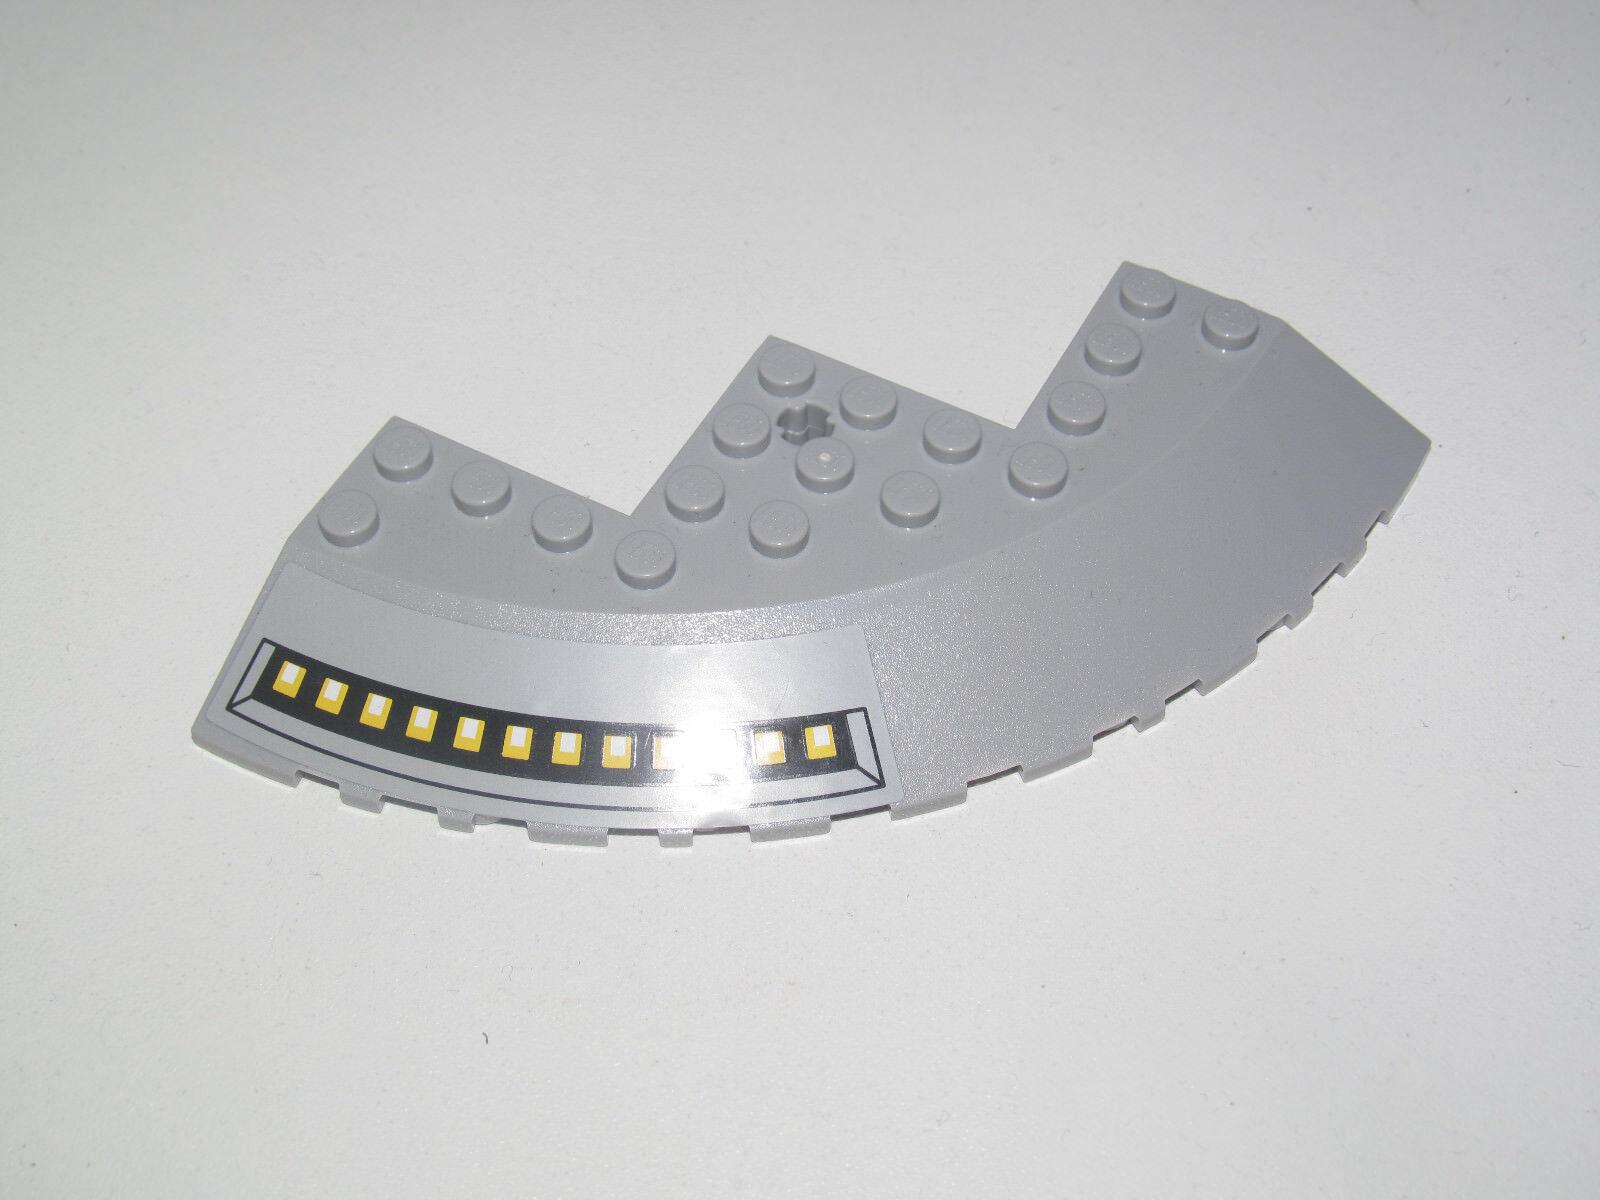 LEGO Brique Arrondie Brick 10x10 Corner Round Slope 33 Edge choose color 58846